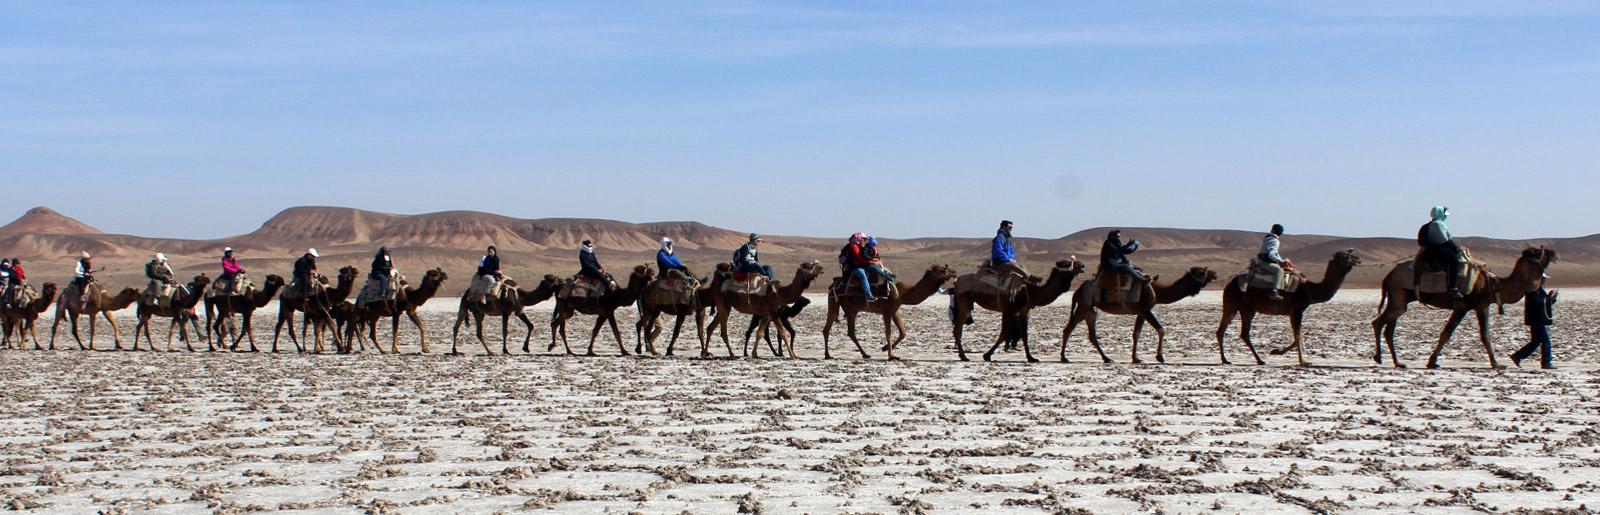 Desert Tour of Maranjab; Multi Activity Adventure